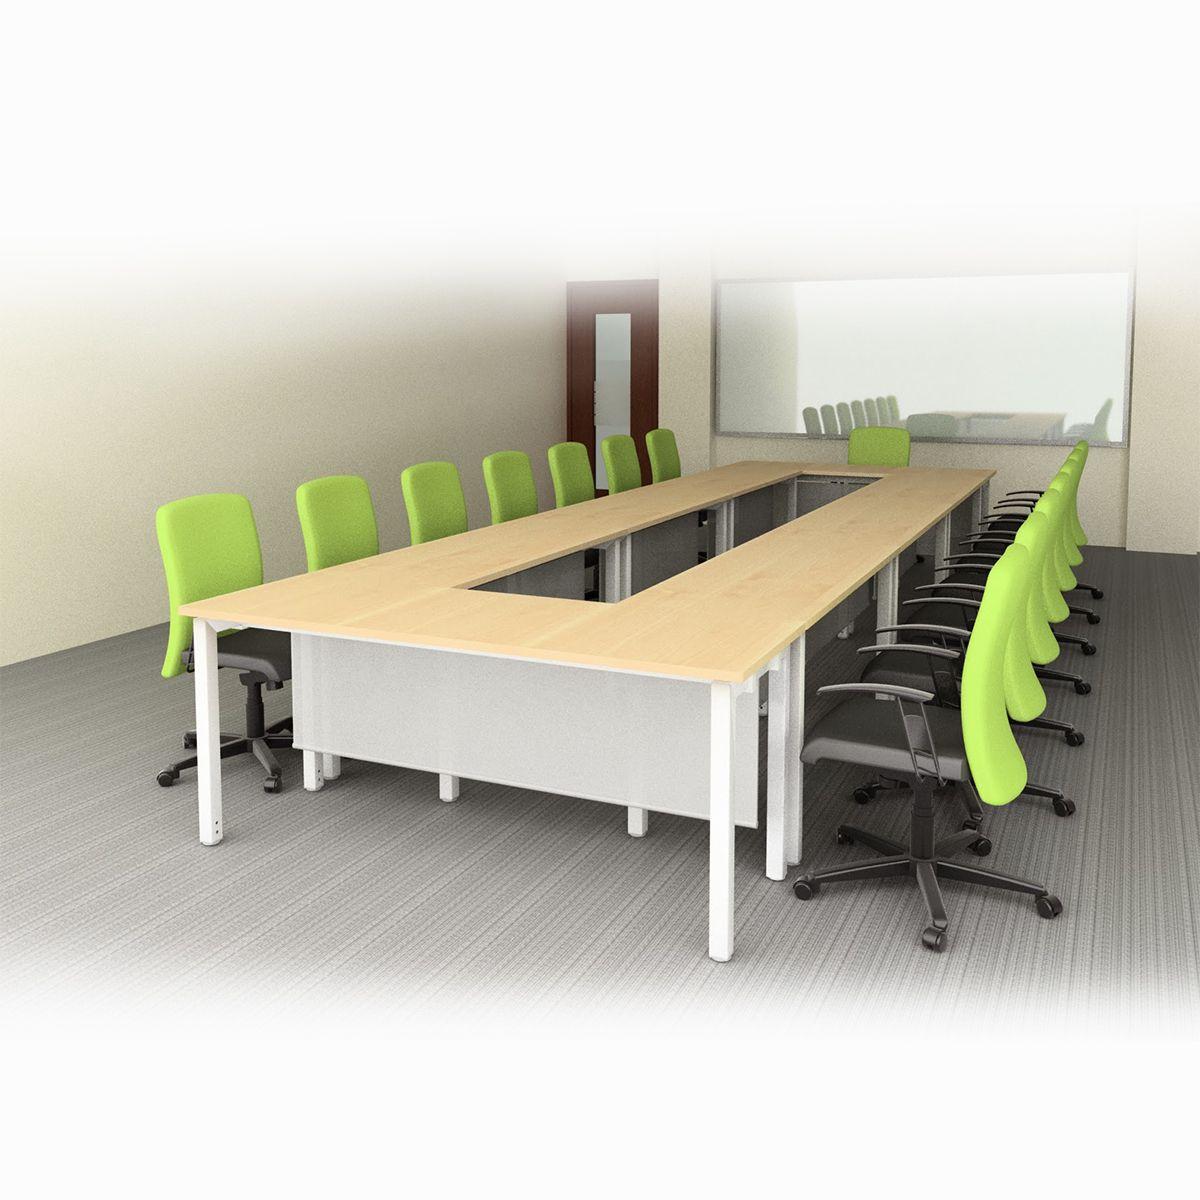 Brilliant Office Meeting Table Office Furniture Dubai Abu Dhabi Uae Download Free Architecture Designs Scobabritishbridgeorg